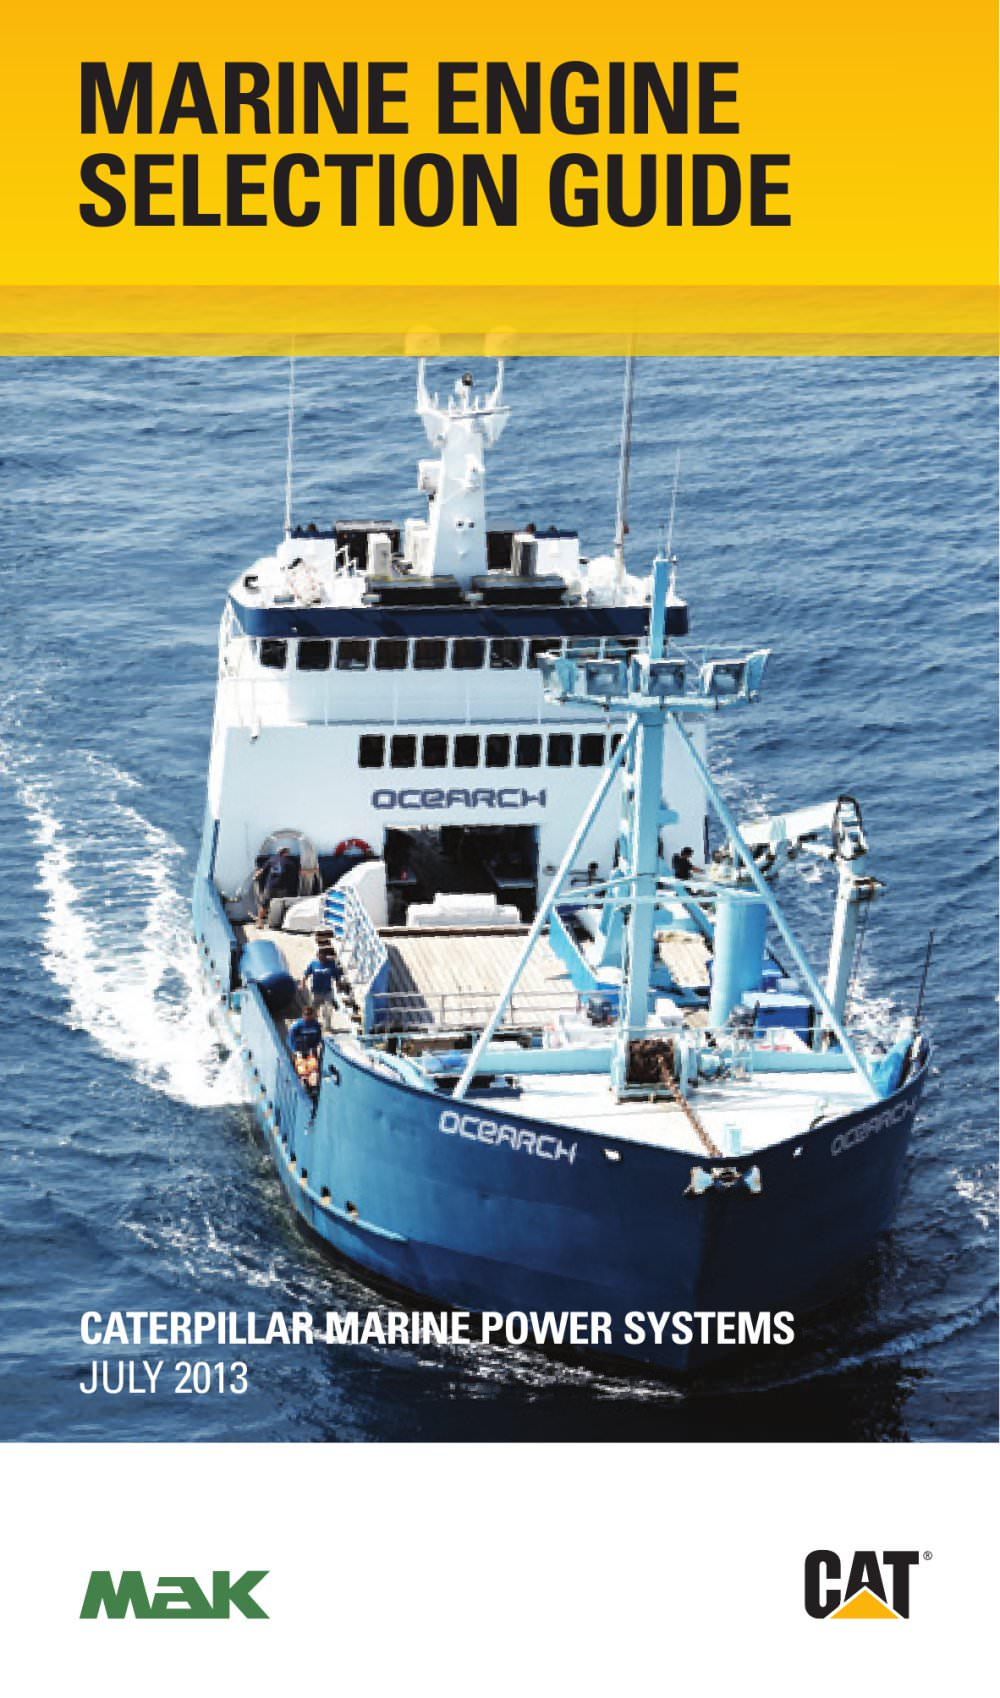 marine engine selection guide caterpillar marine power systems rh pdf nauticexpo com Caterpillar Diesel Generator caterpillar generator installation guide pdf